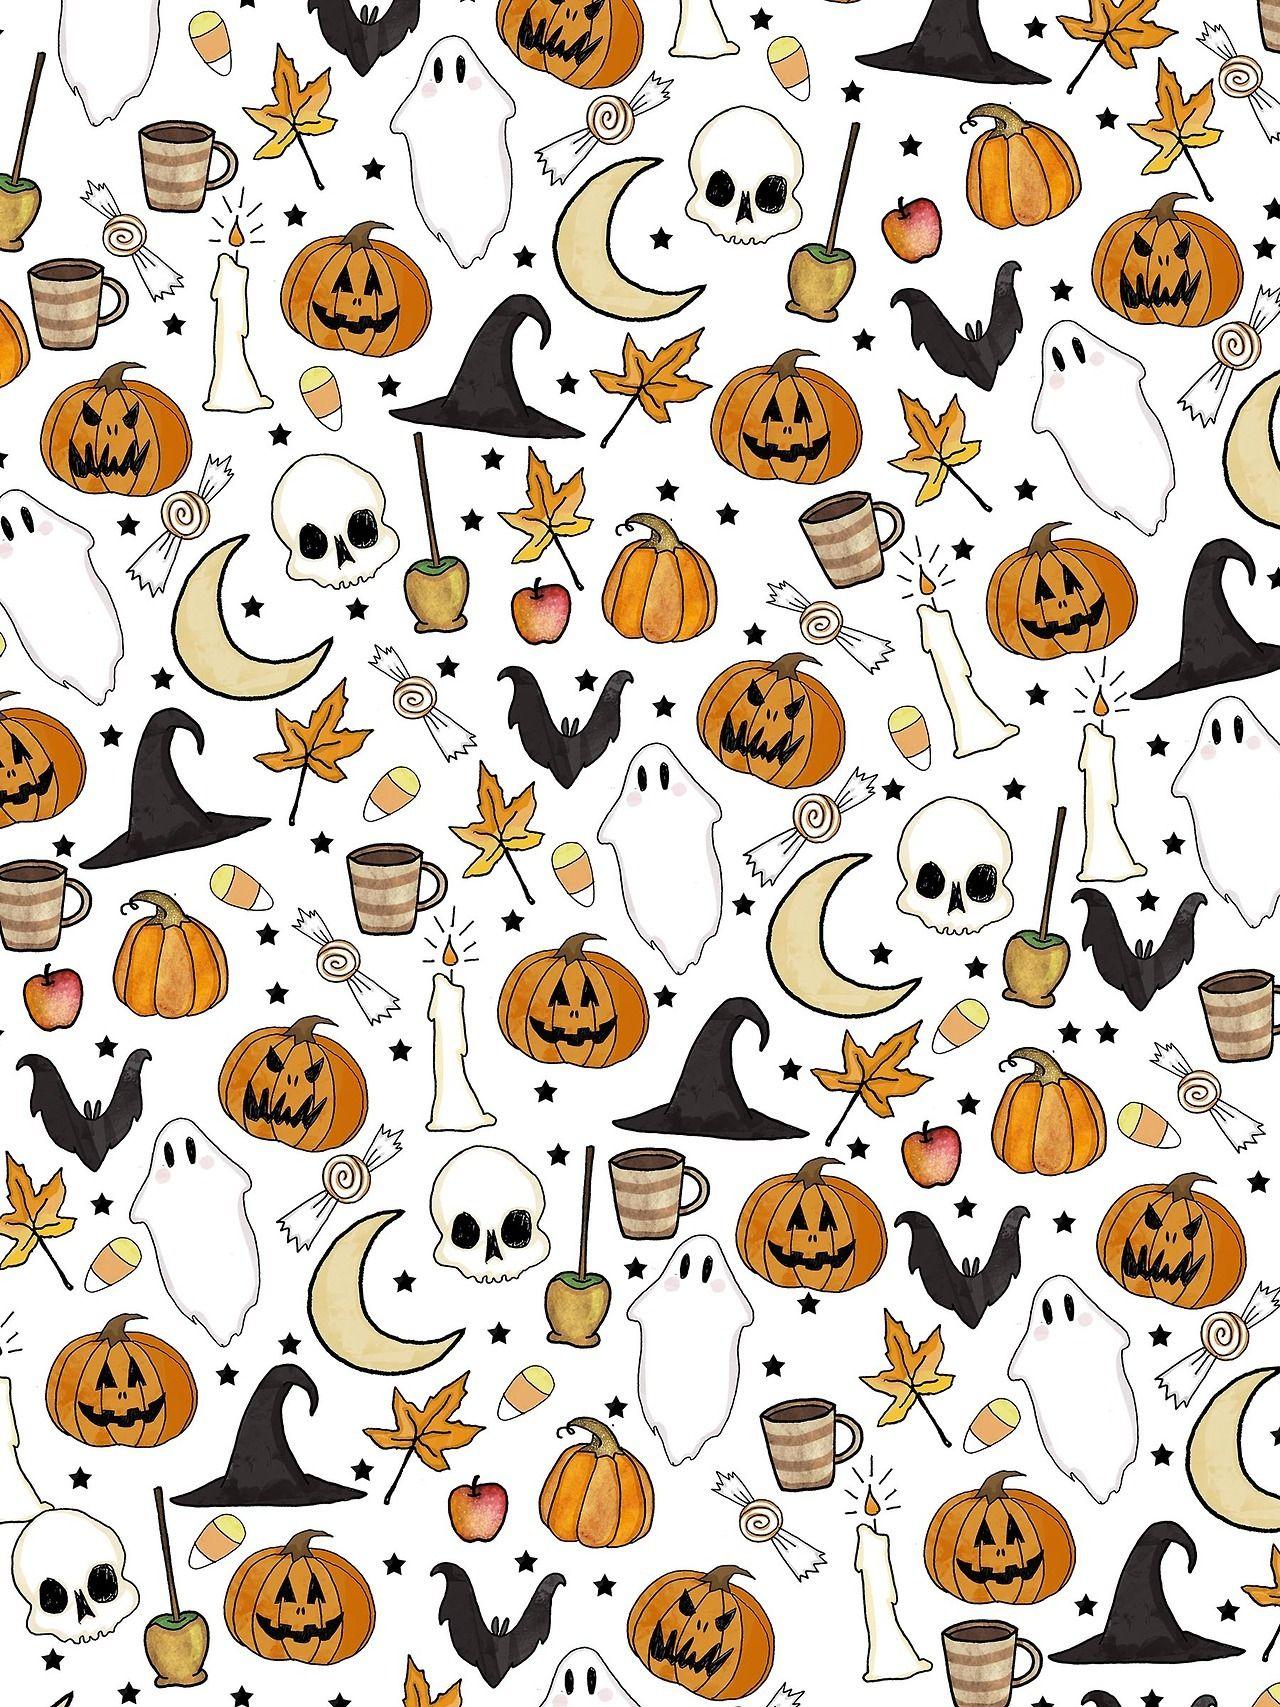 Darthjordyn I Just Love Halloween So Much You Guys Cute Fall Wallpaper Halloween Wallpaper Iphone Fall Wallpaper